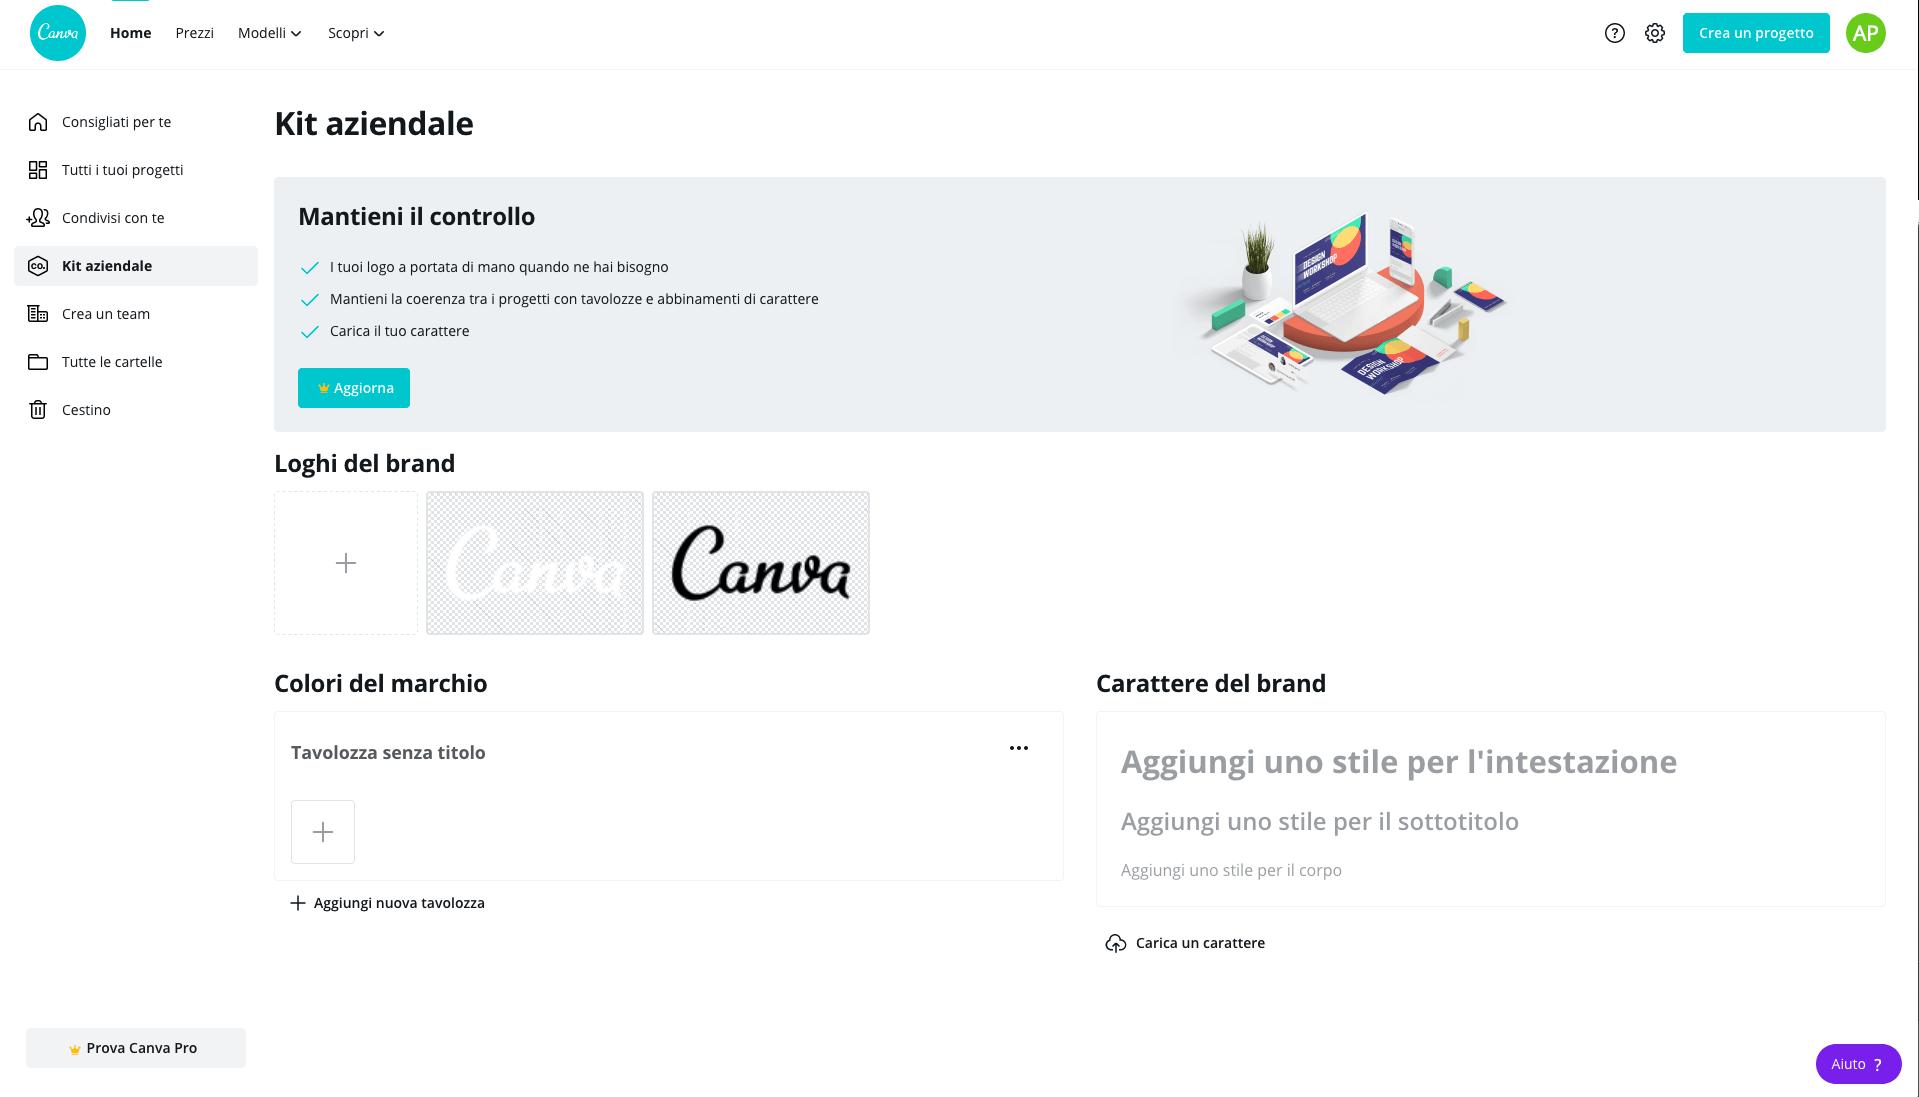 Canva - codesign - brand